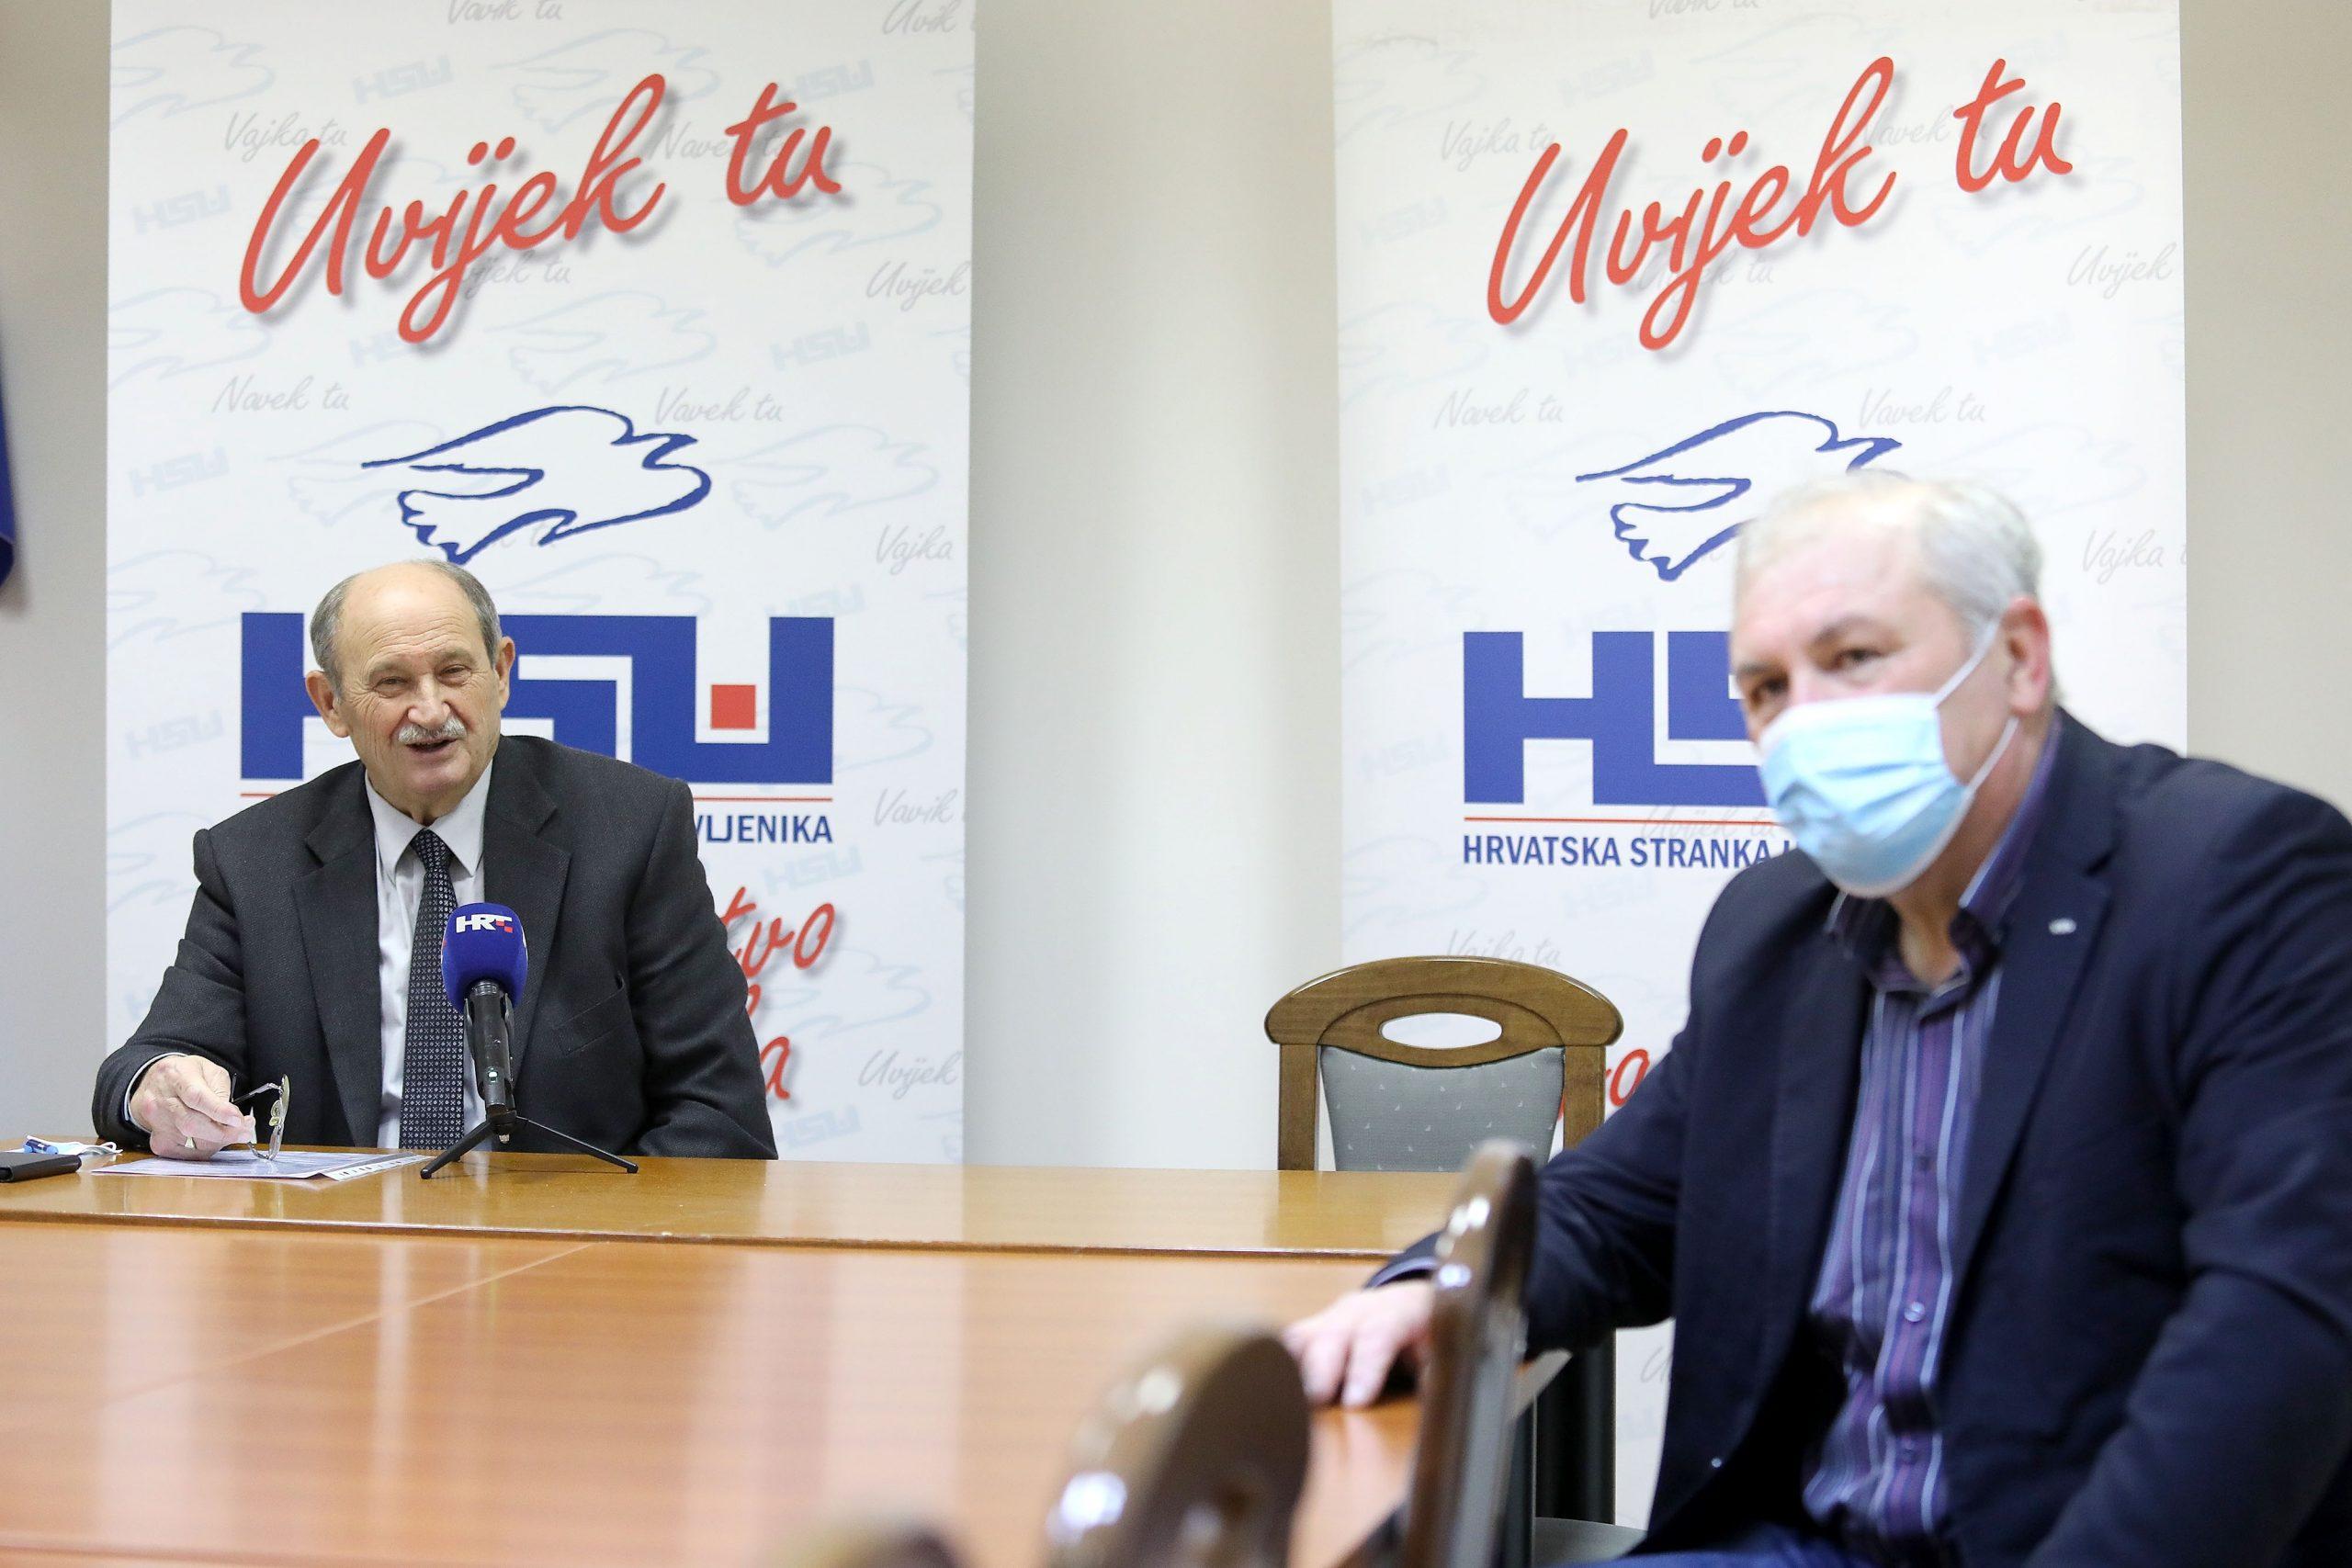 Veselko Gabričević i Silvano Hrelja / Photo: Patrik Macek/PIXSELL